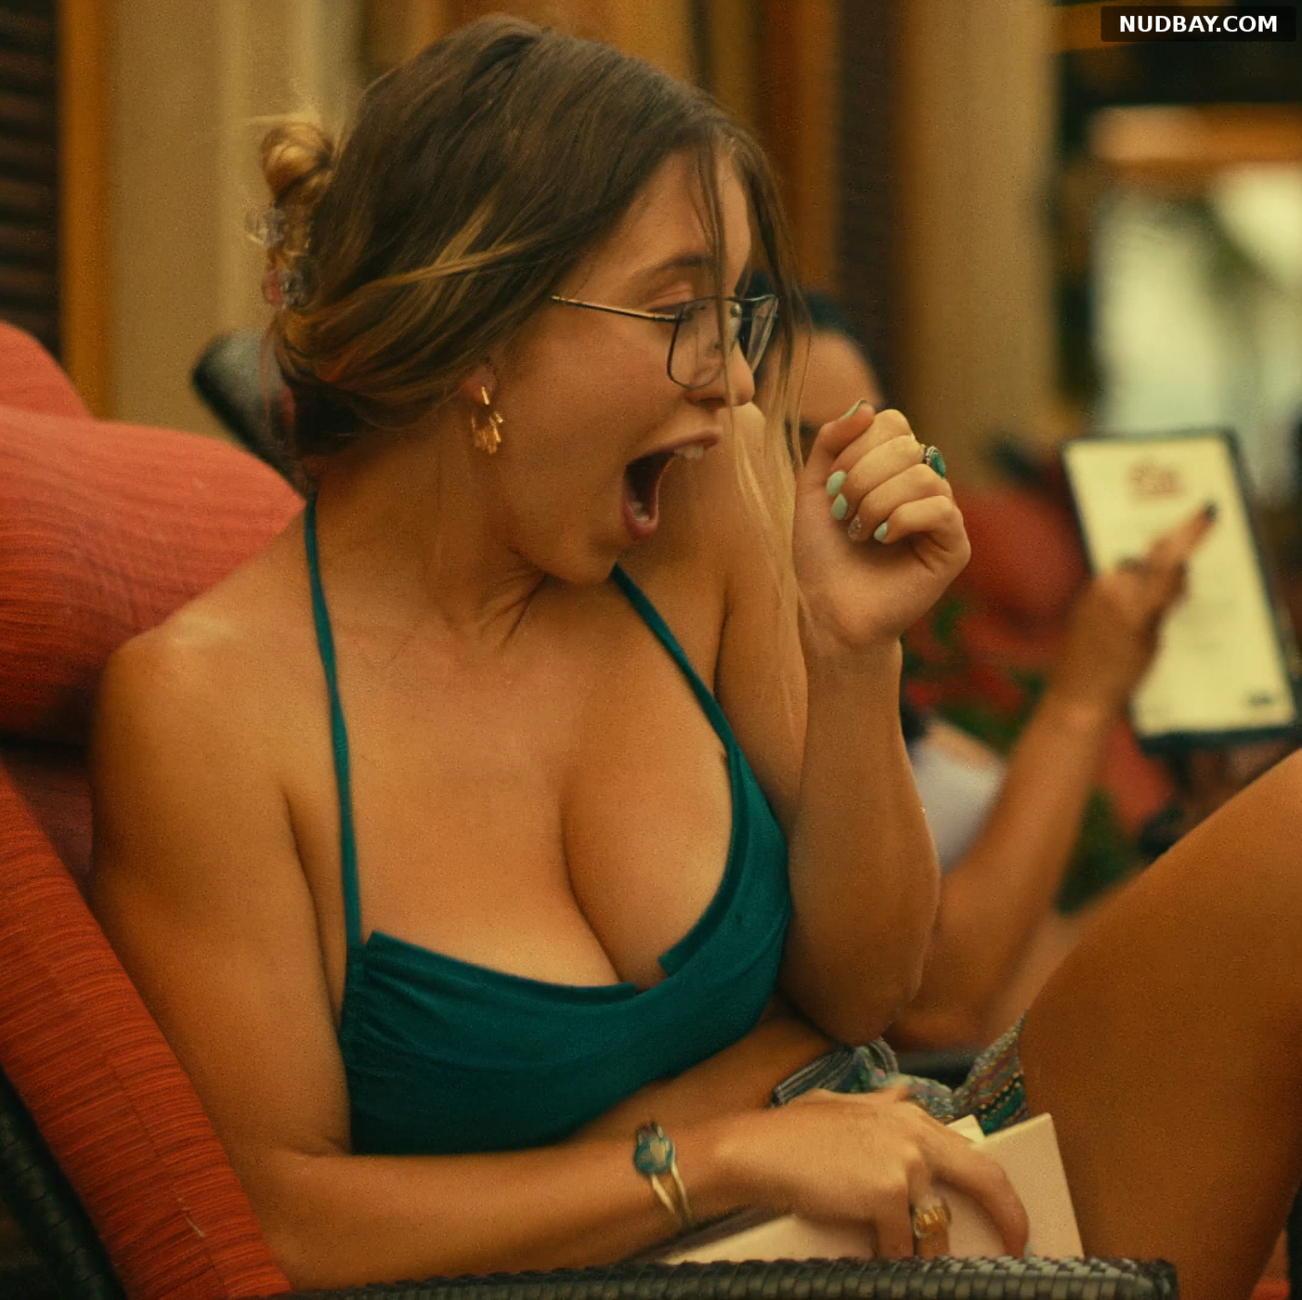 Sydney Sweeney boobs in The White Lotus S01E03 (2021)